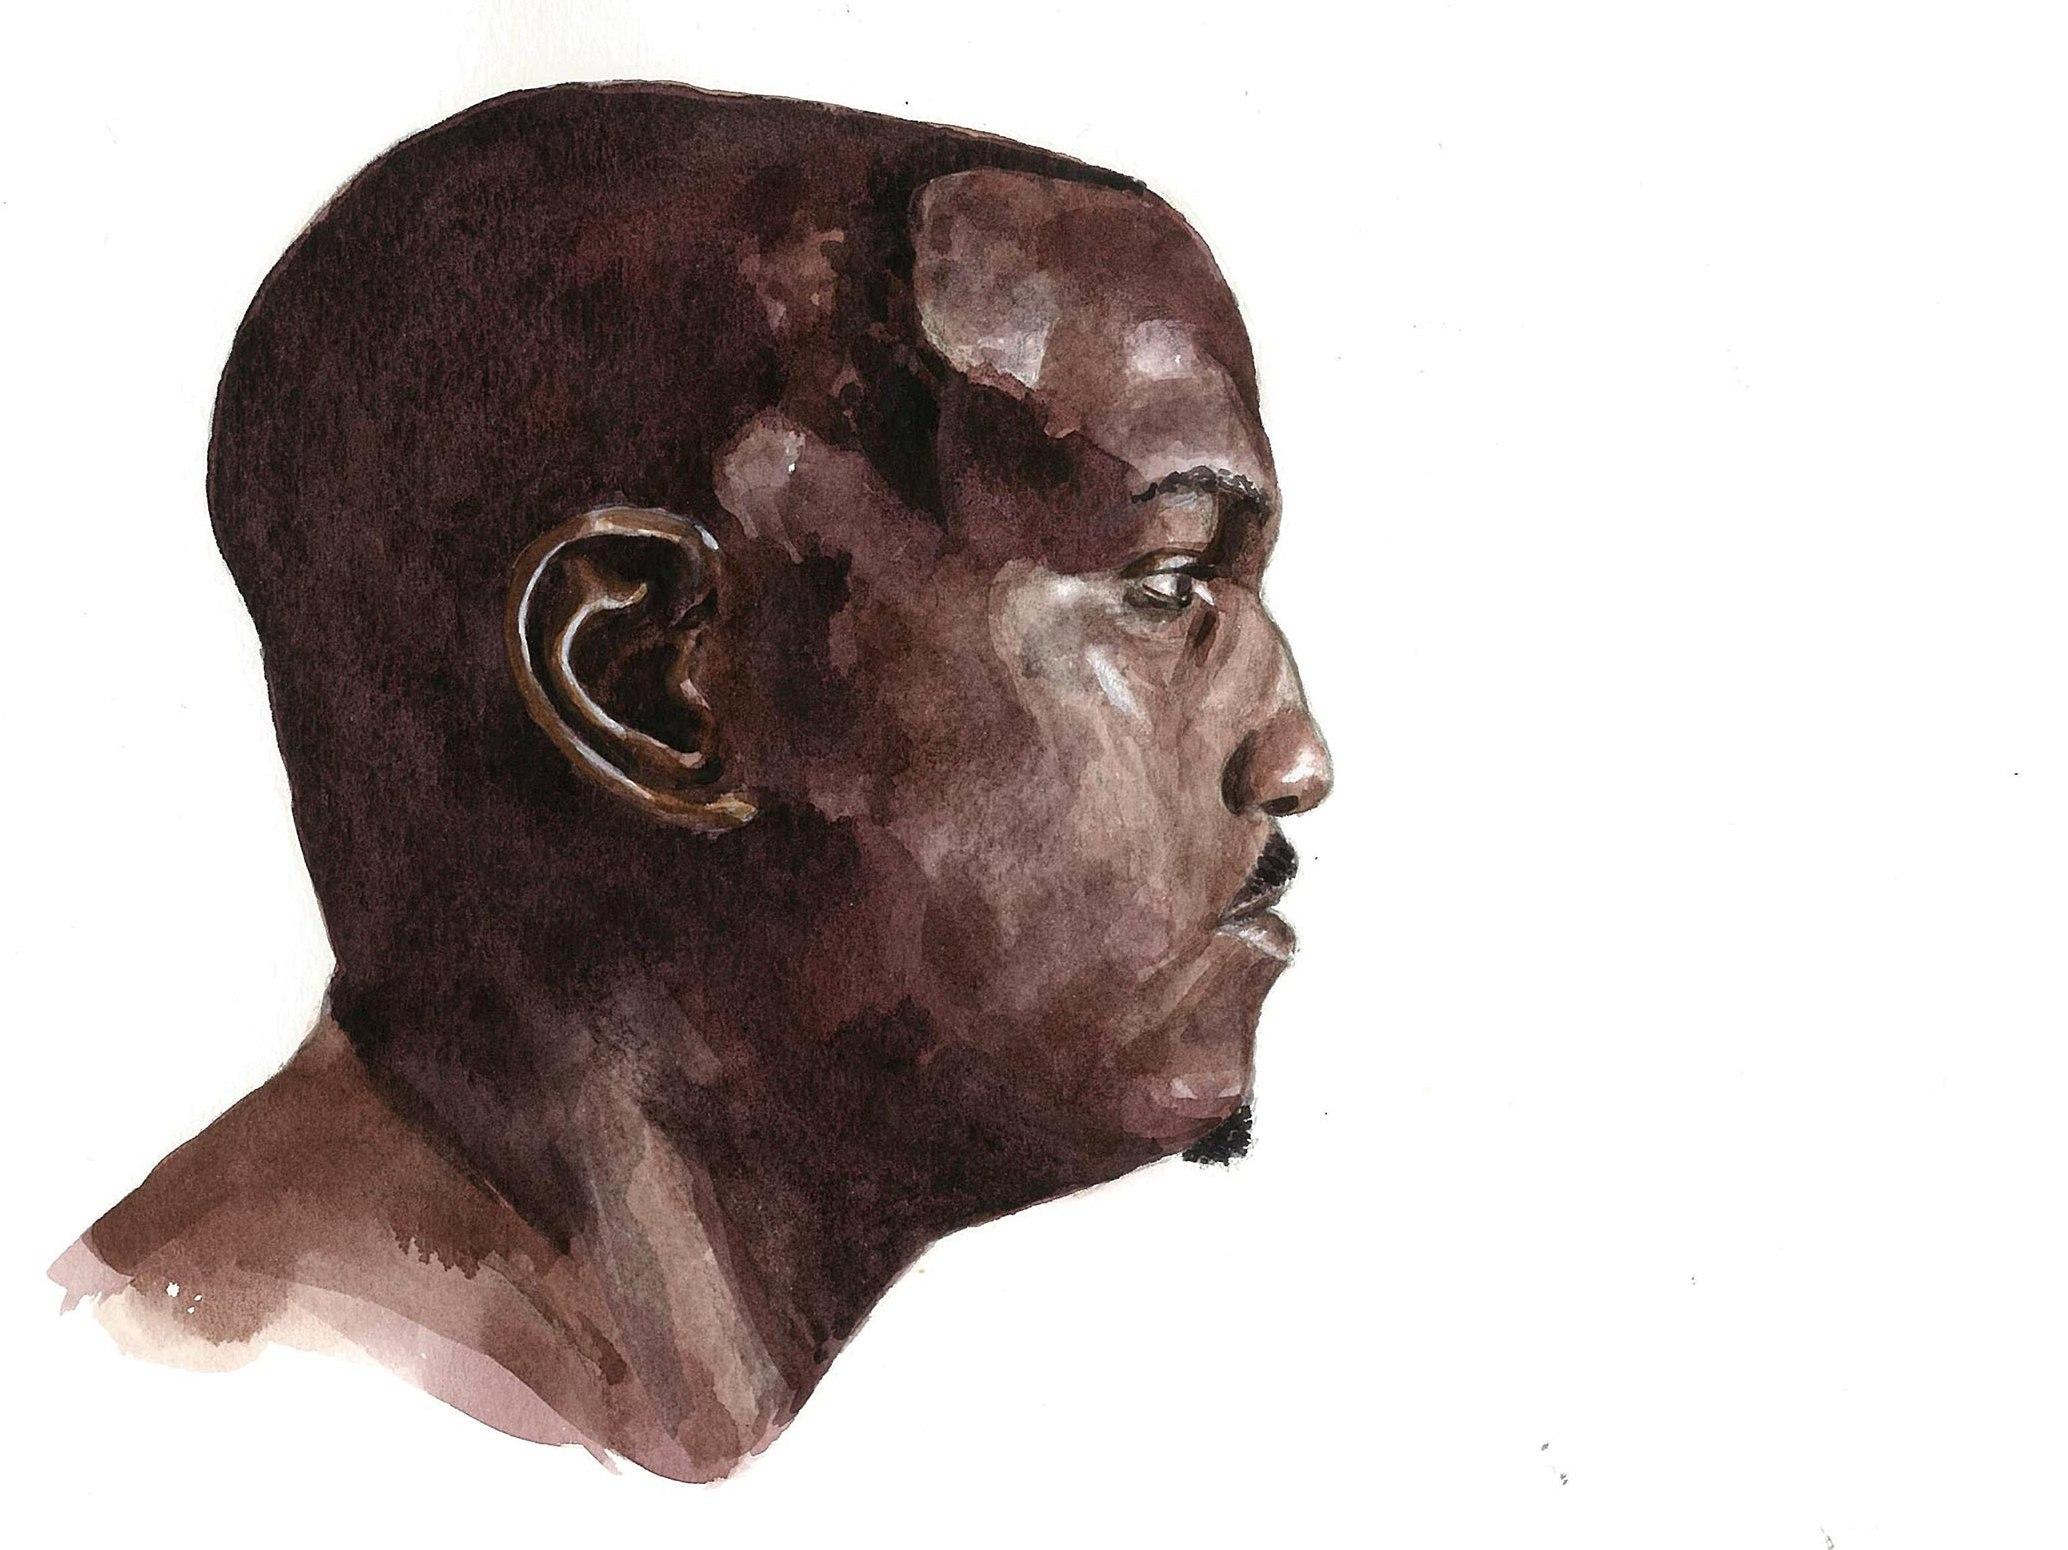 Masaustu Yuz Boyama Portre Profil Burun Suluboya Kafa